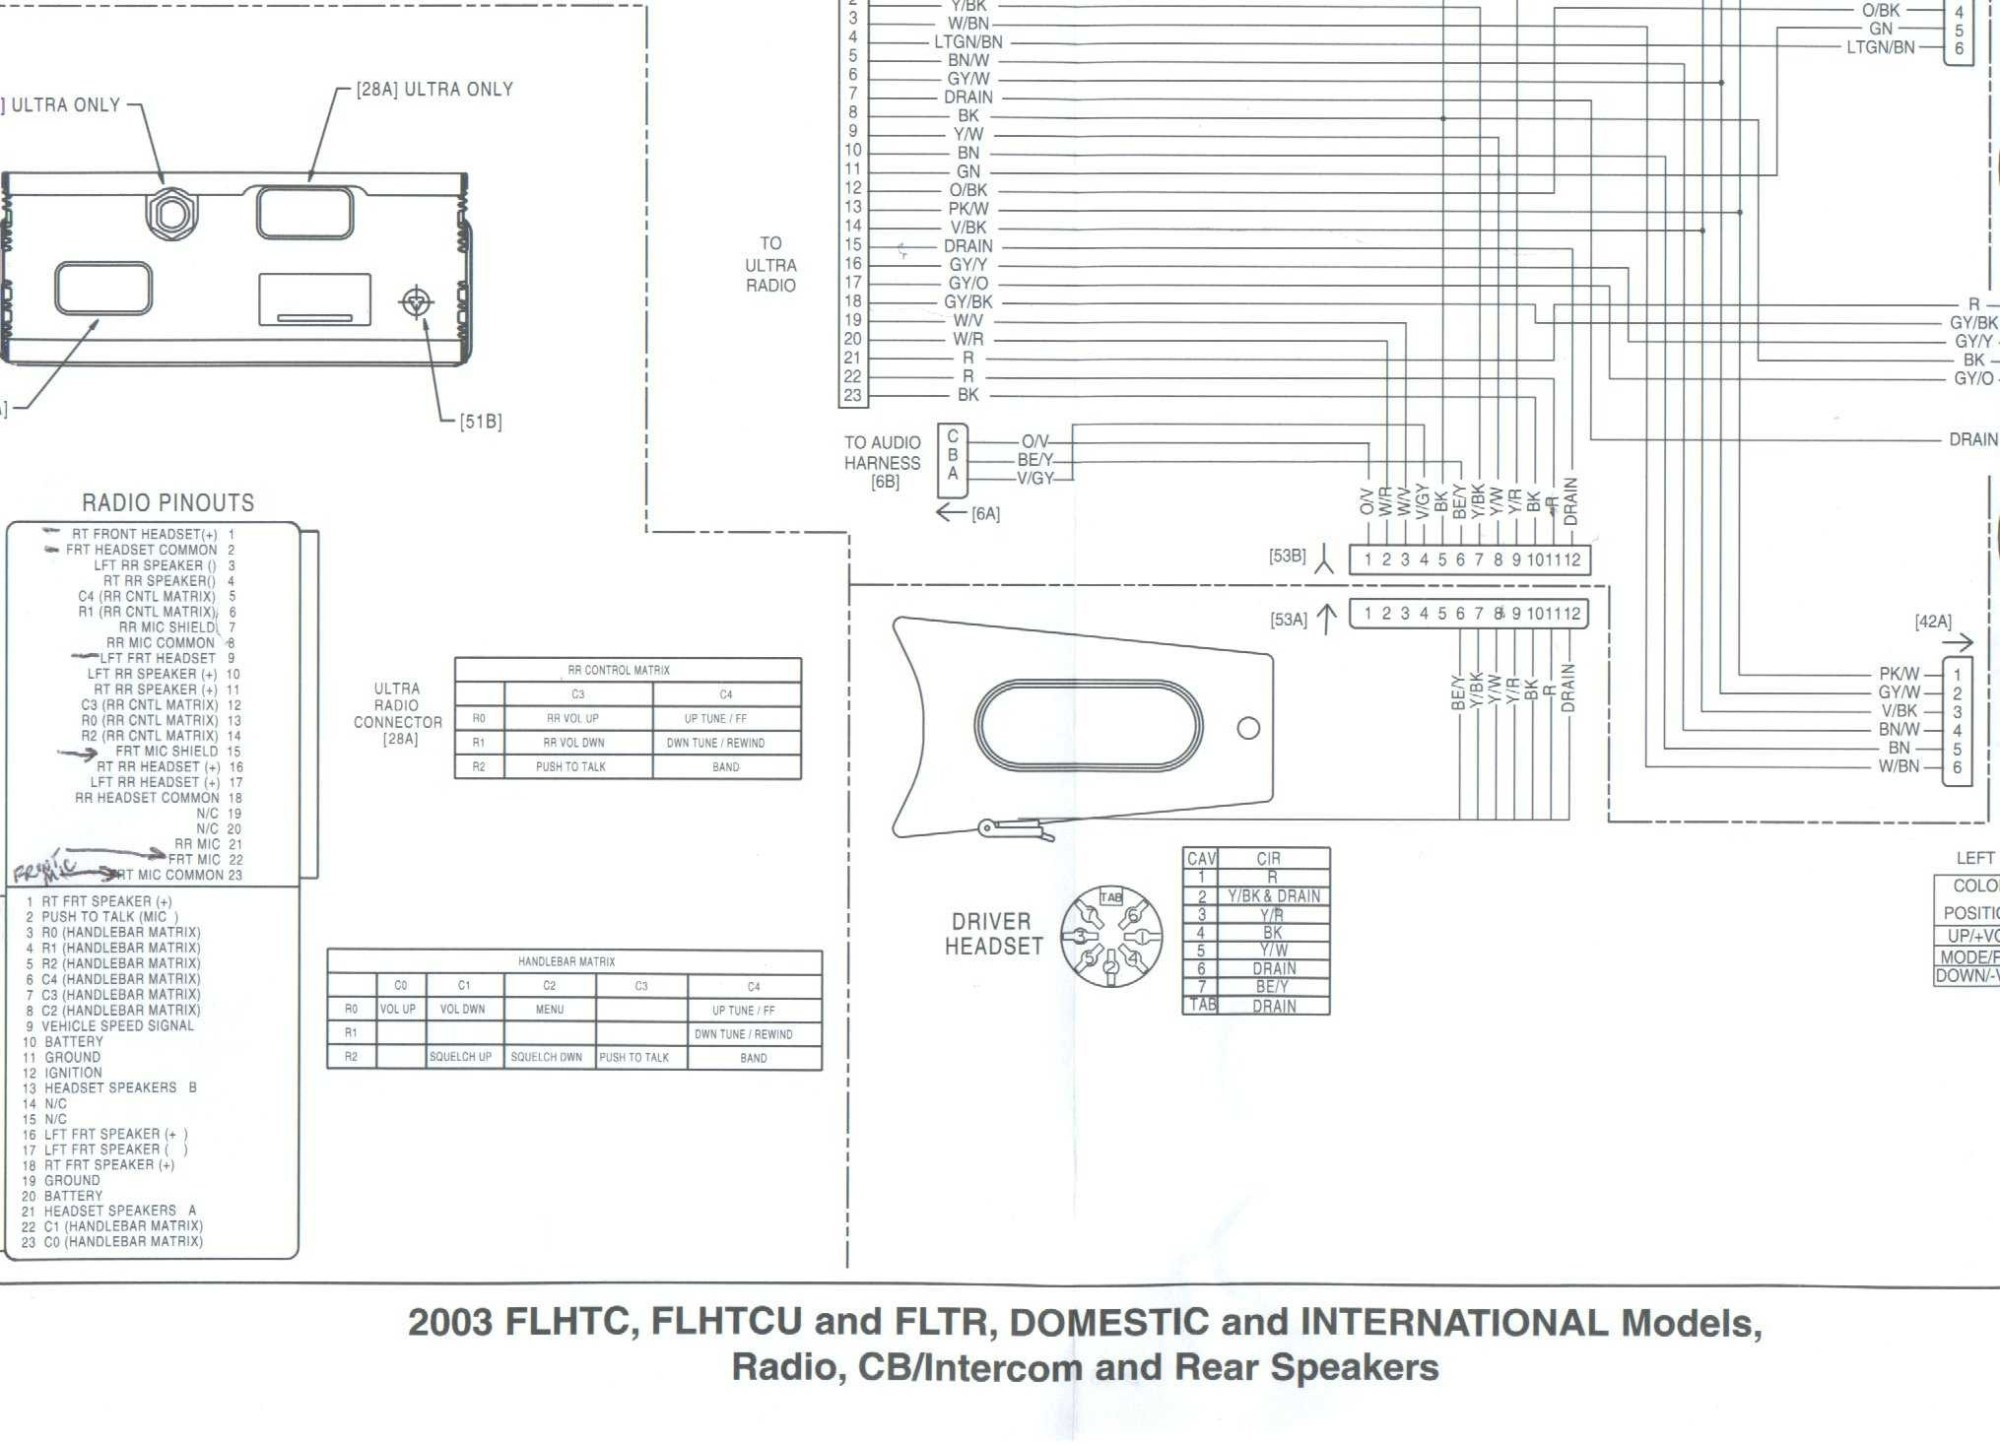 hight resolution of 1992 flhtcu harley davidson radio wiring diagram wiring diagramfree harley davidson wiring diagram wiring libraryharley davidson